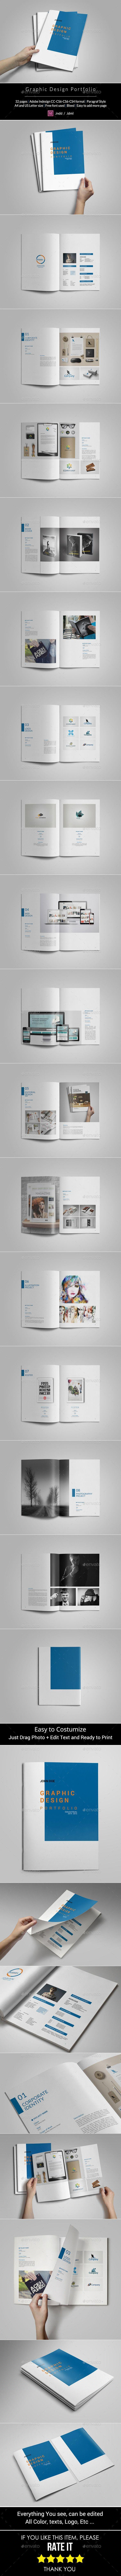 Portfolio Brochure Template - Portfolio Brochures